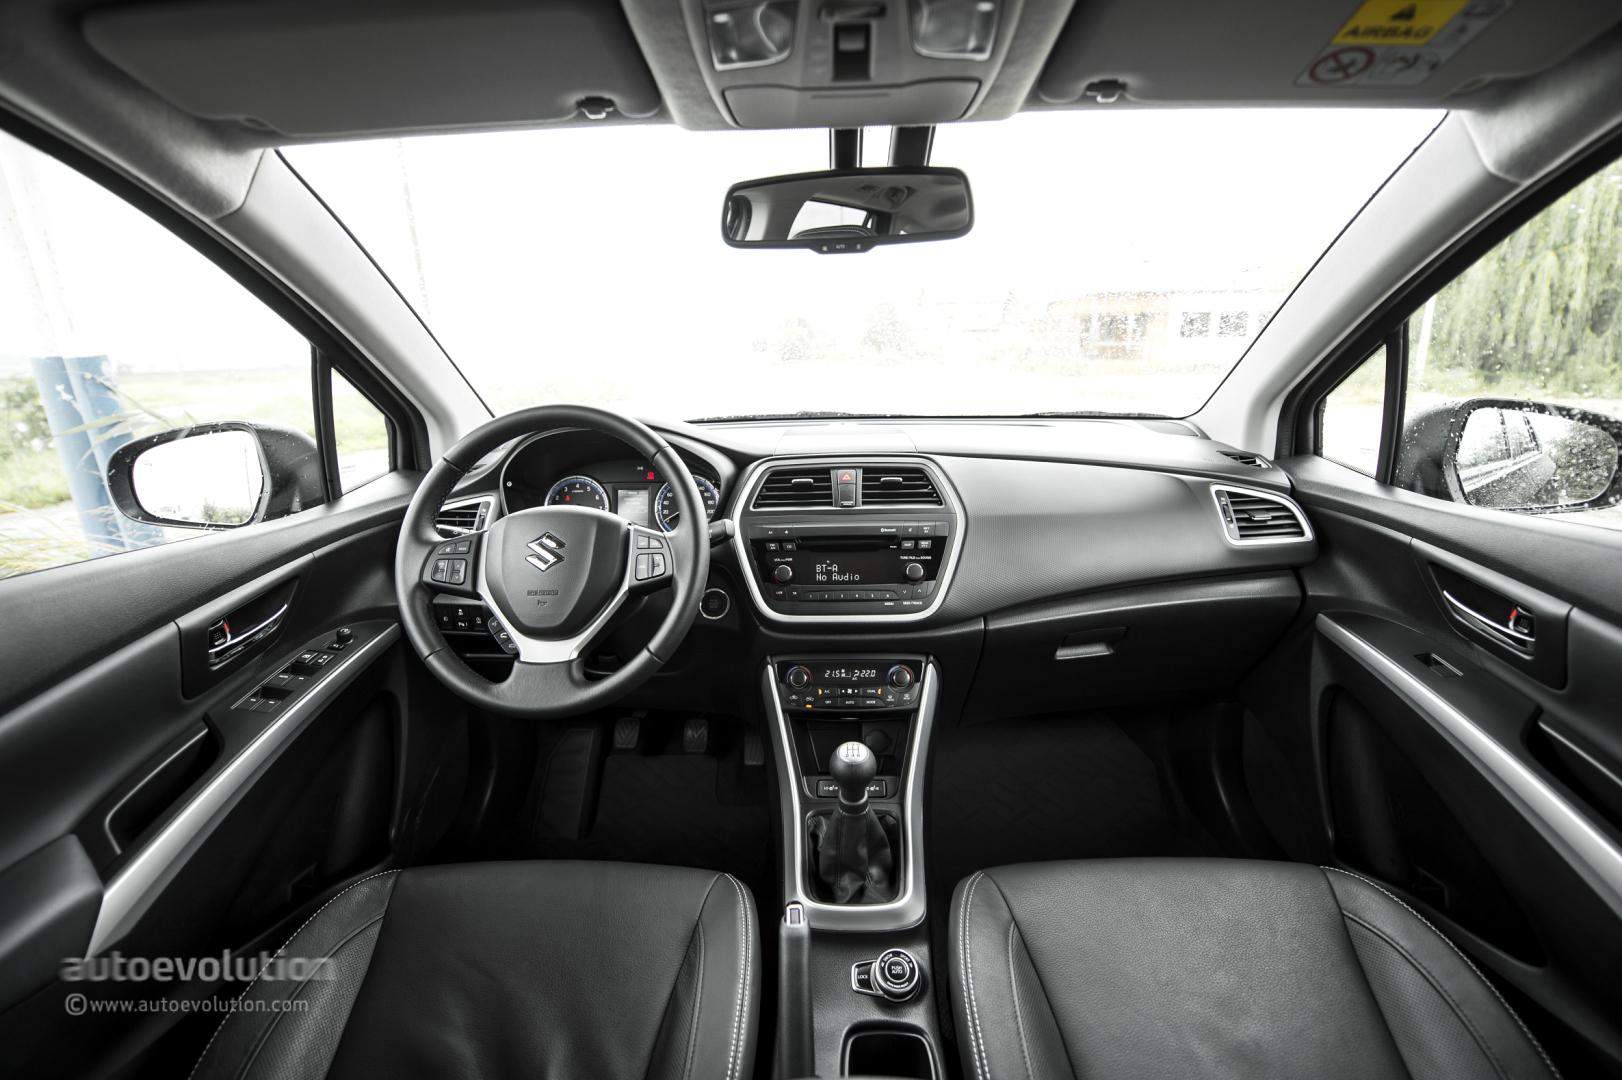 Suzuki SX4 S Cross Review Autoevolution